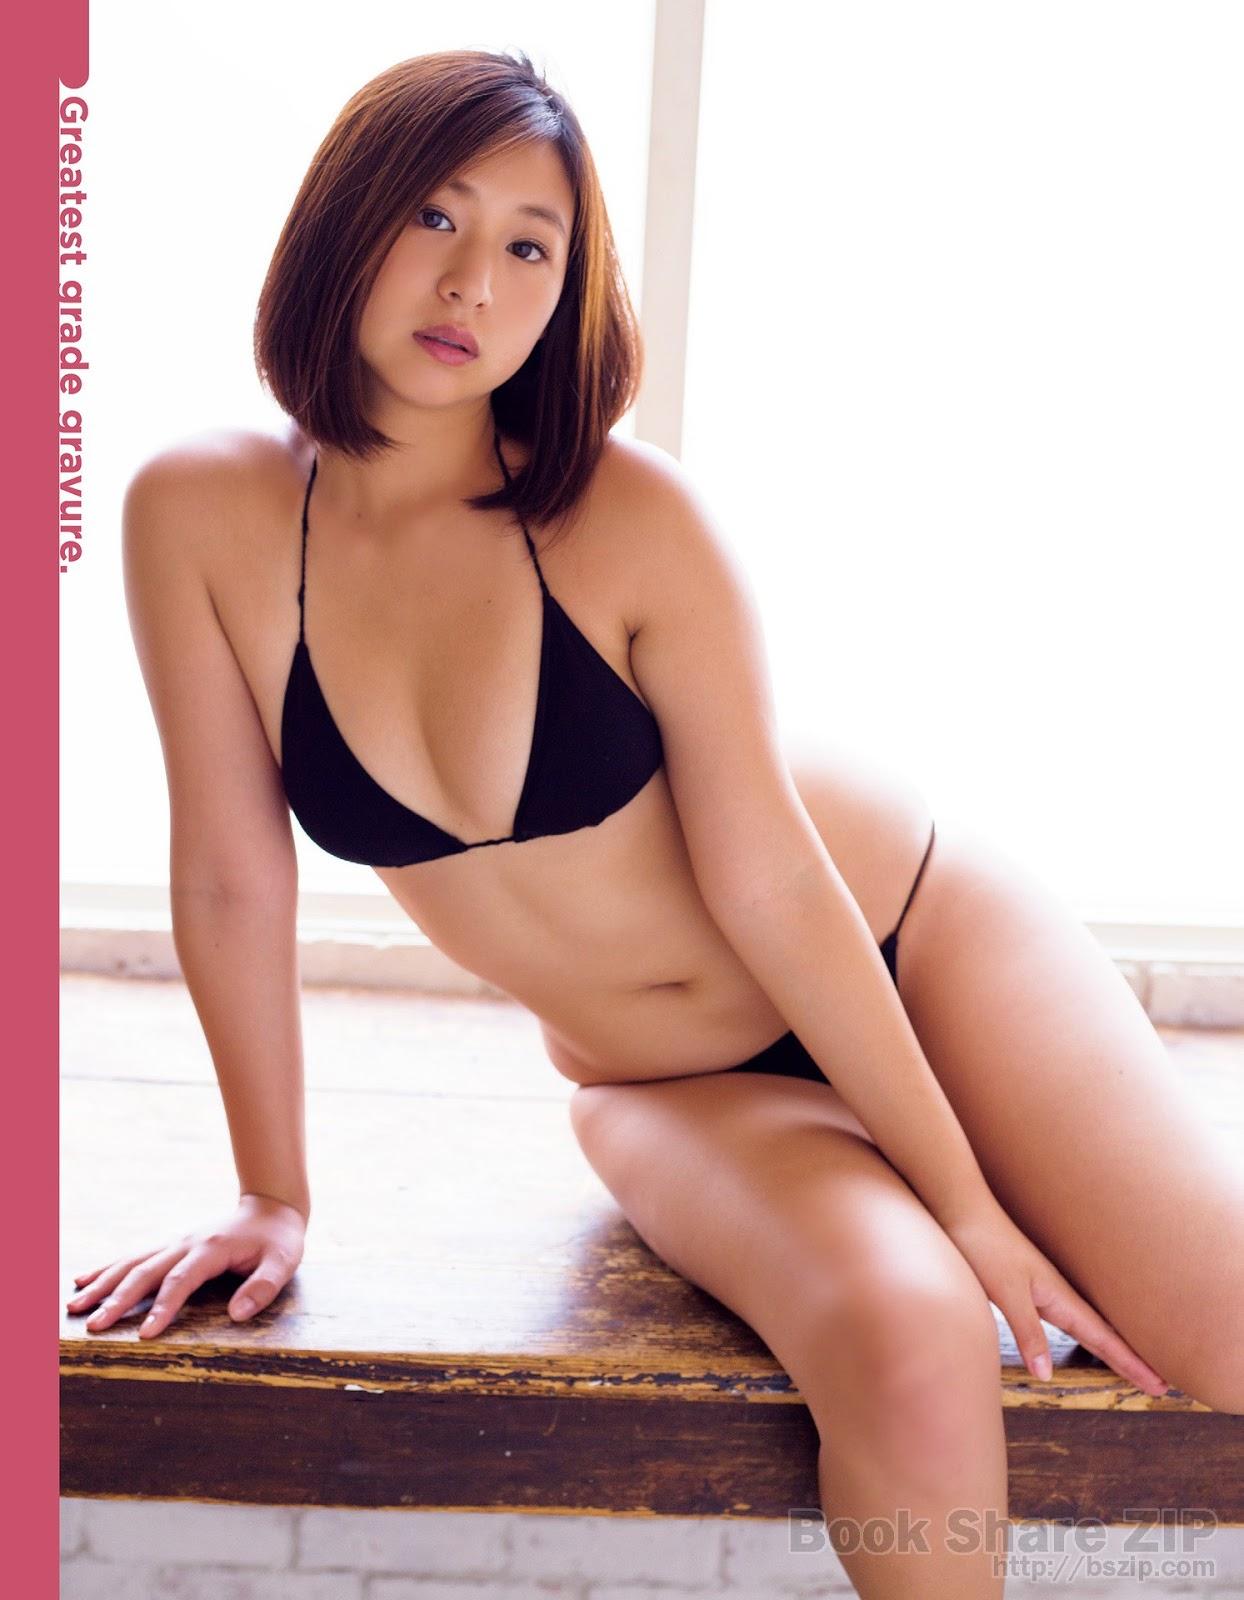 Ayaka Sayama 佐山彩香, Exciting Max! 2017 No.10 (エキサイティングマックス! 2017年10月号)